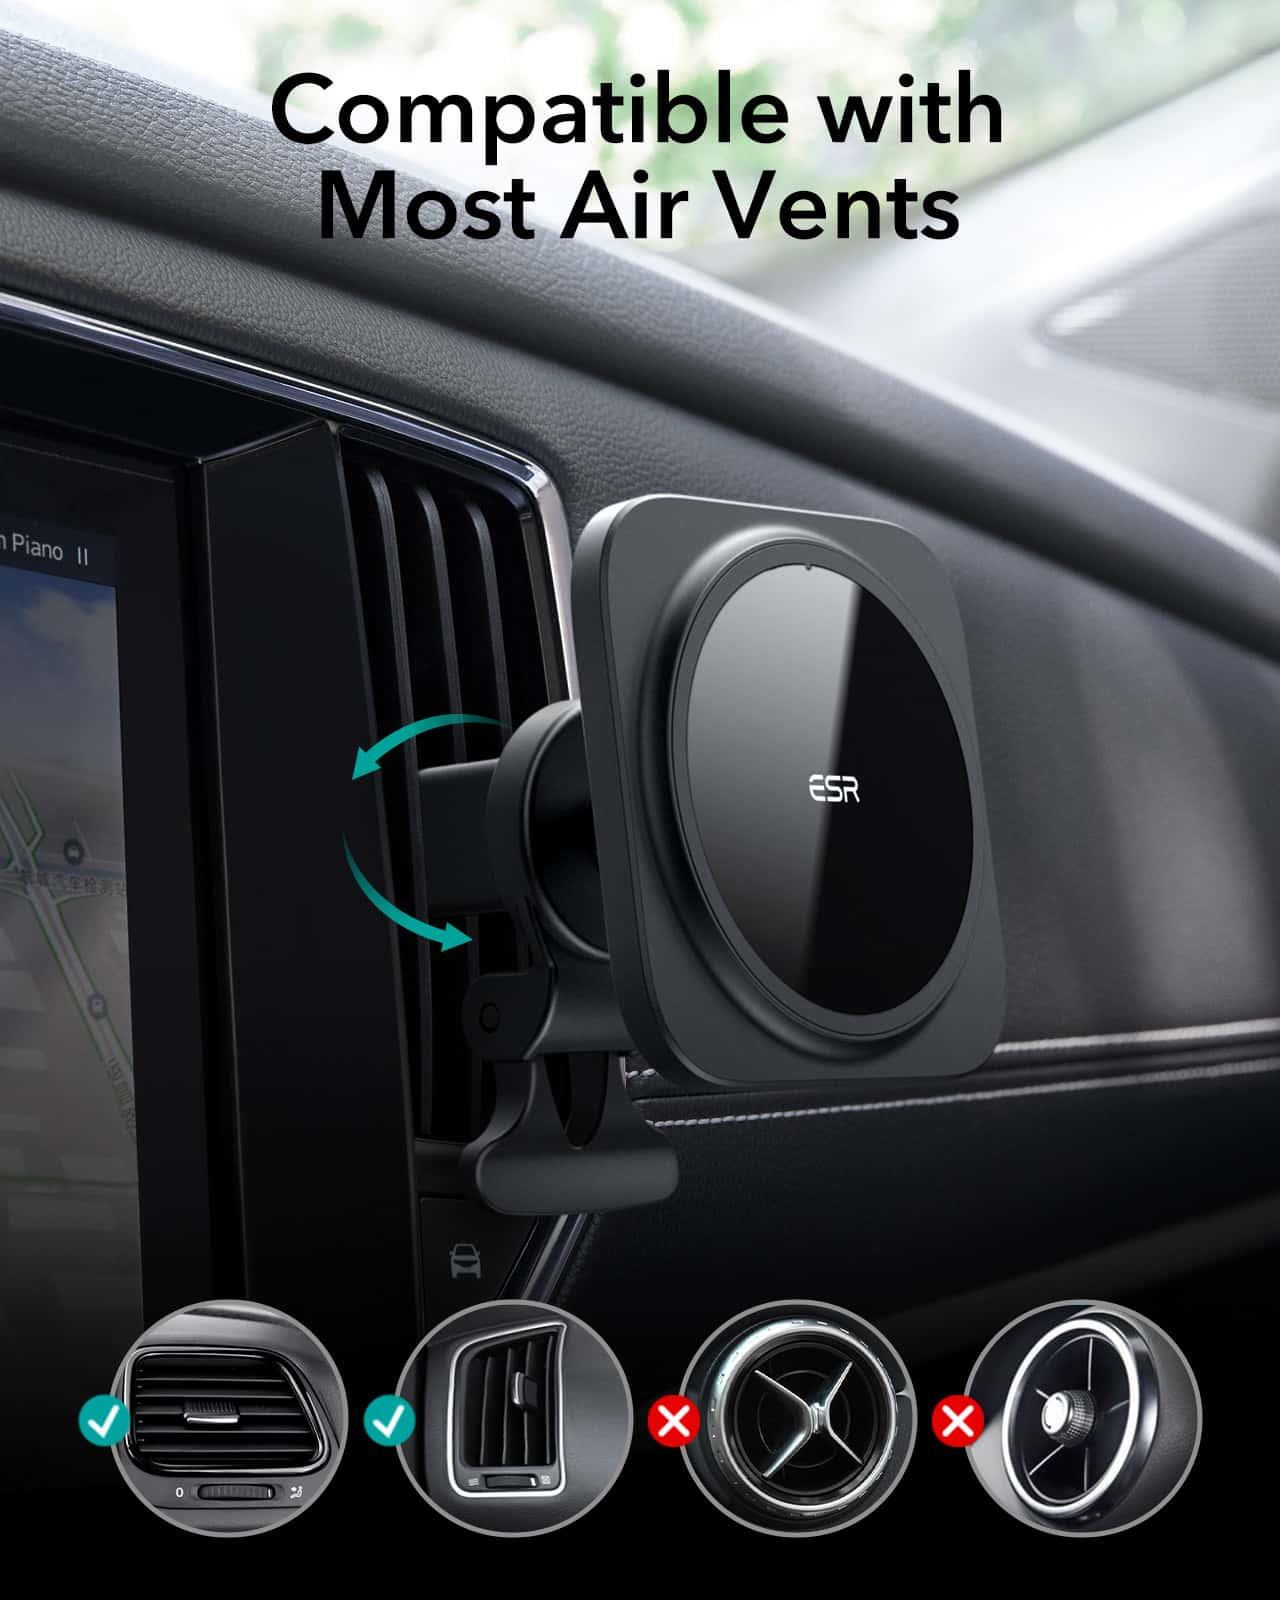 HaloLock Magnetic Car Phone Mount for iPhone 12 Series kf 7